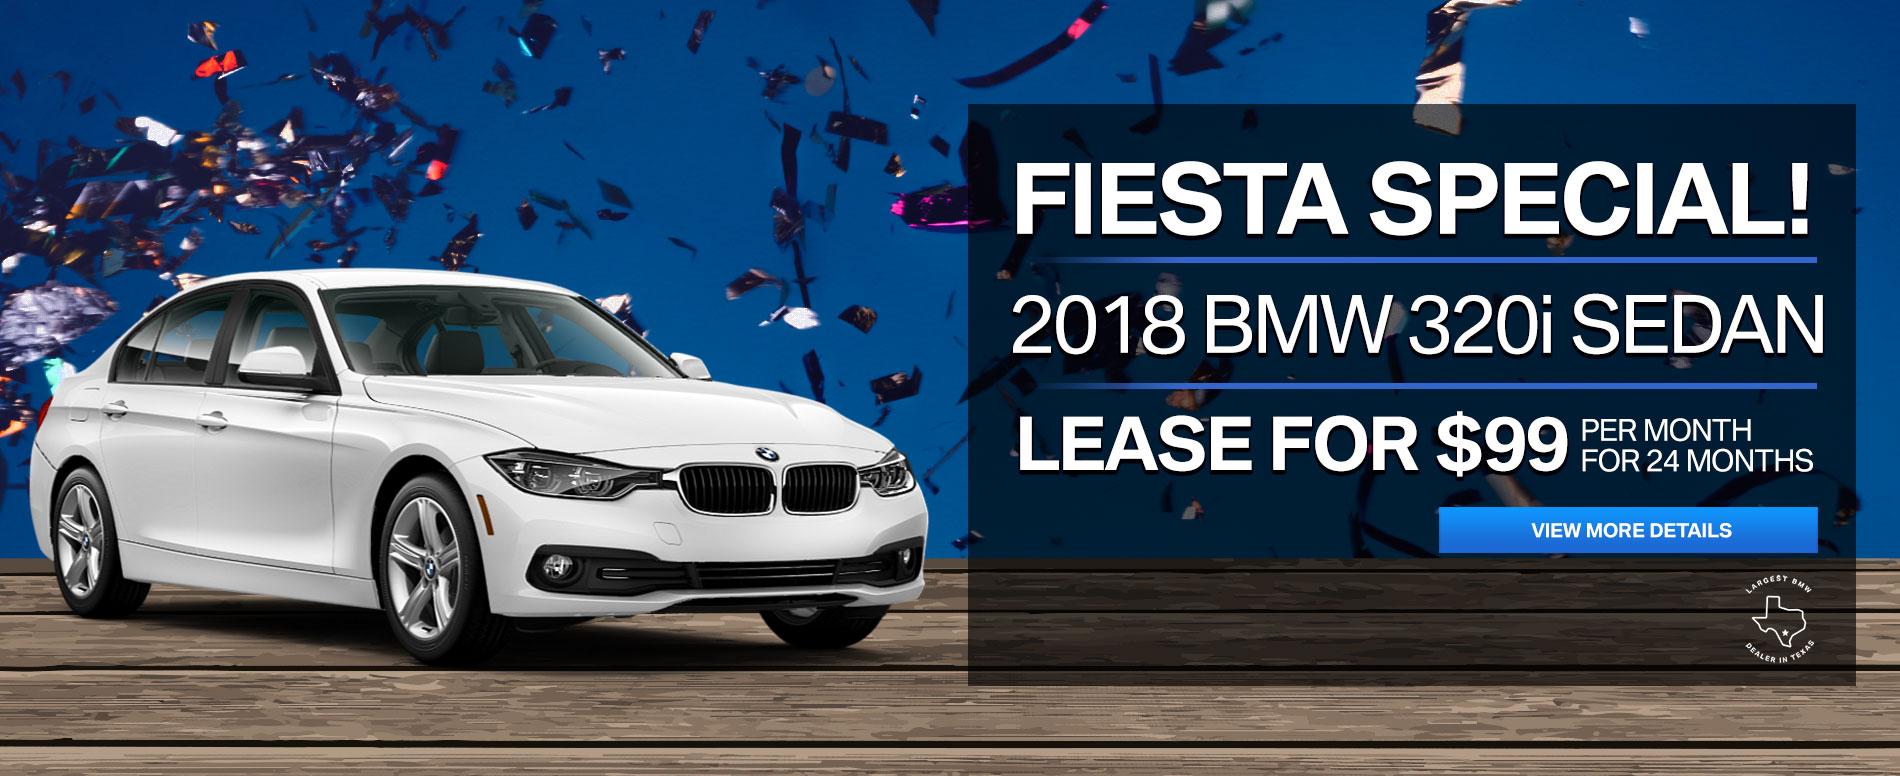 Best Car Dealership In San Antonio Texas